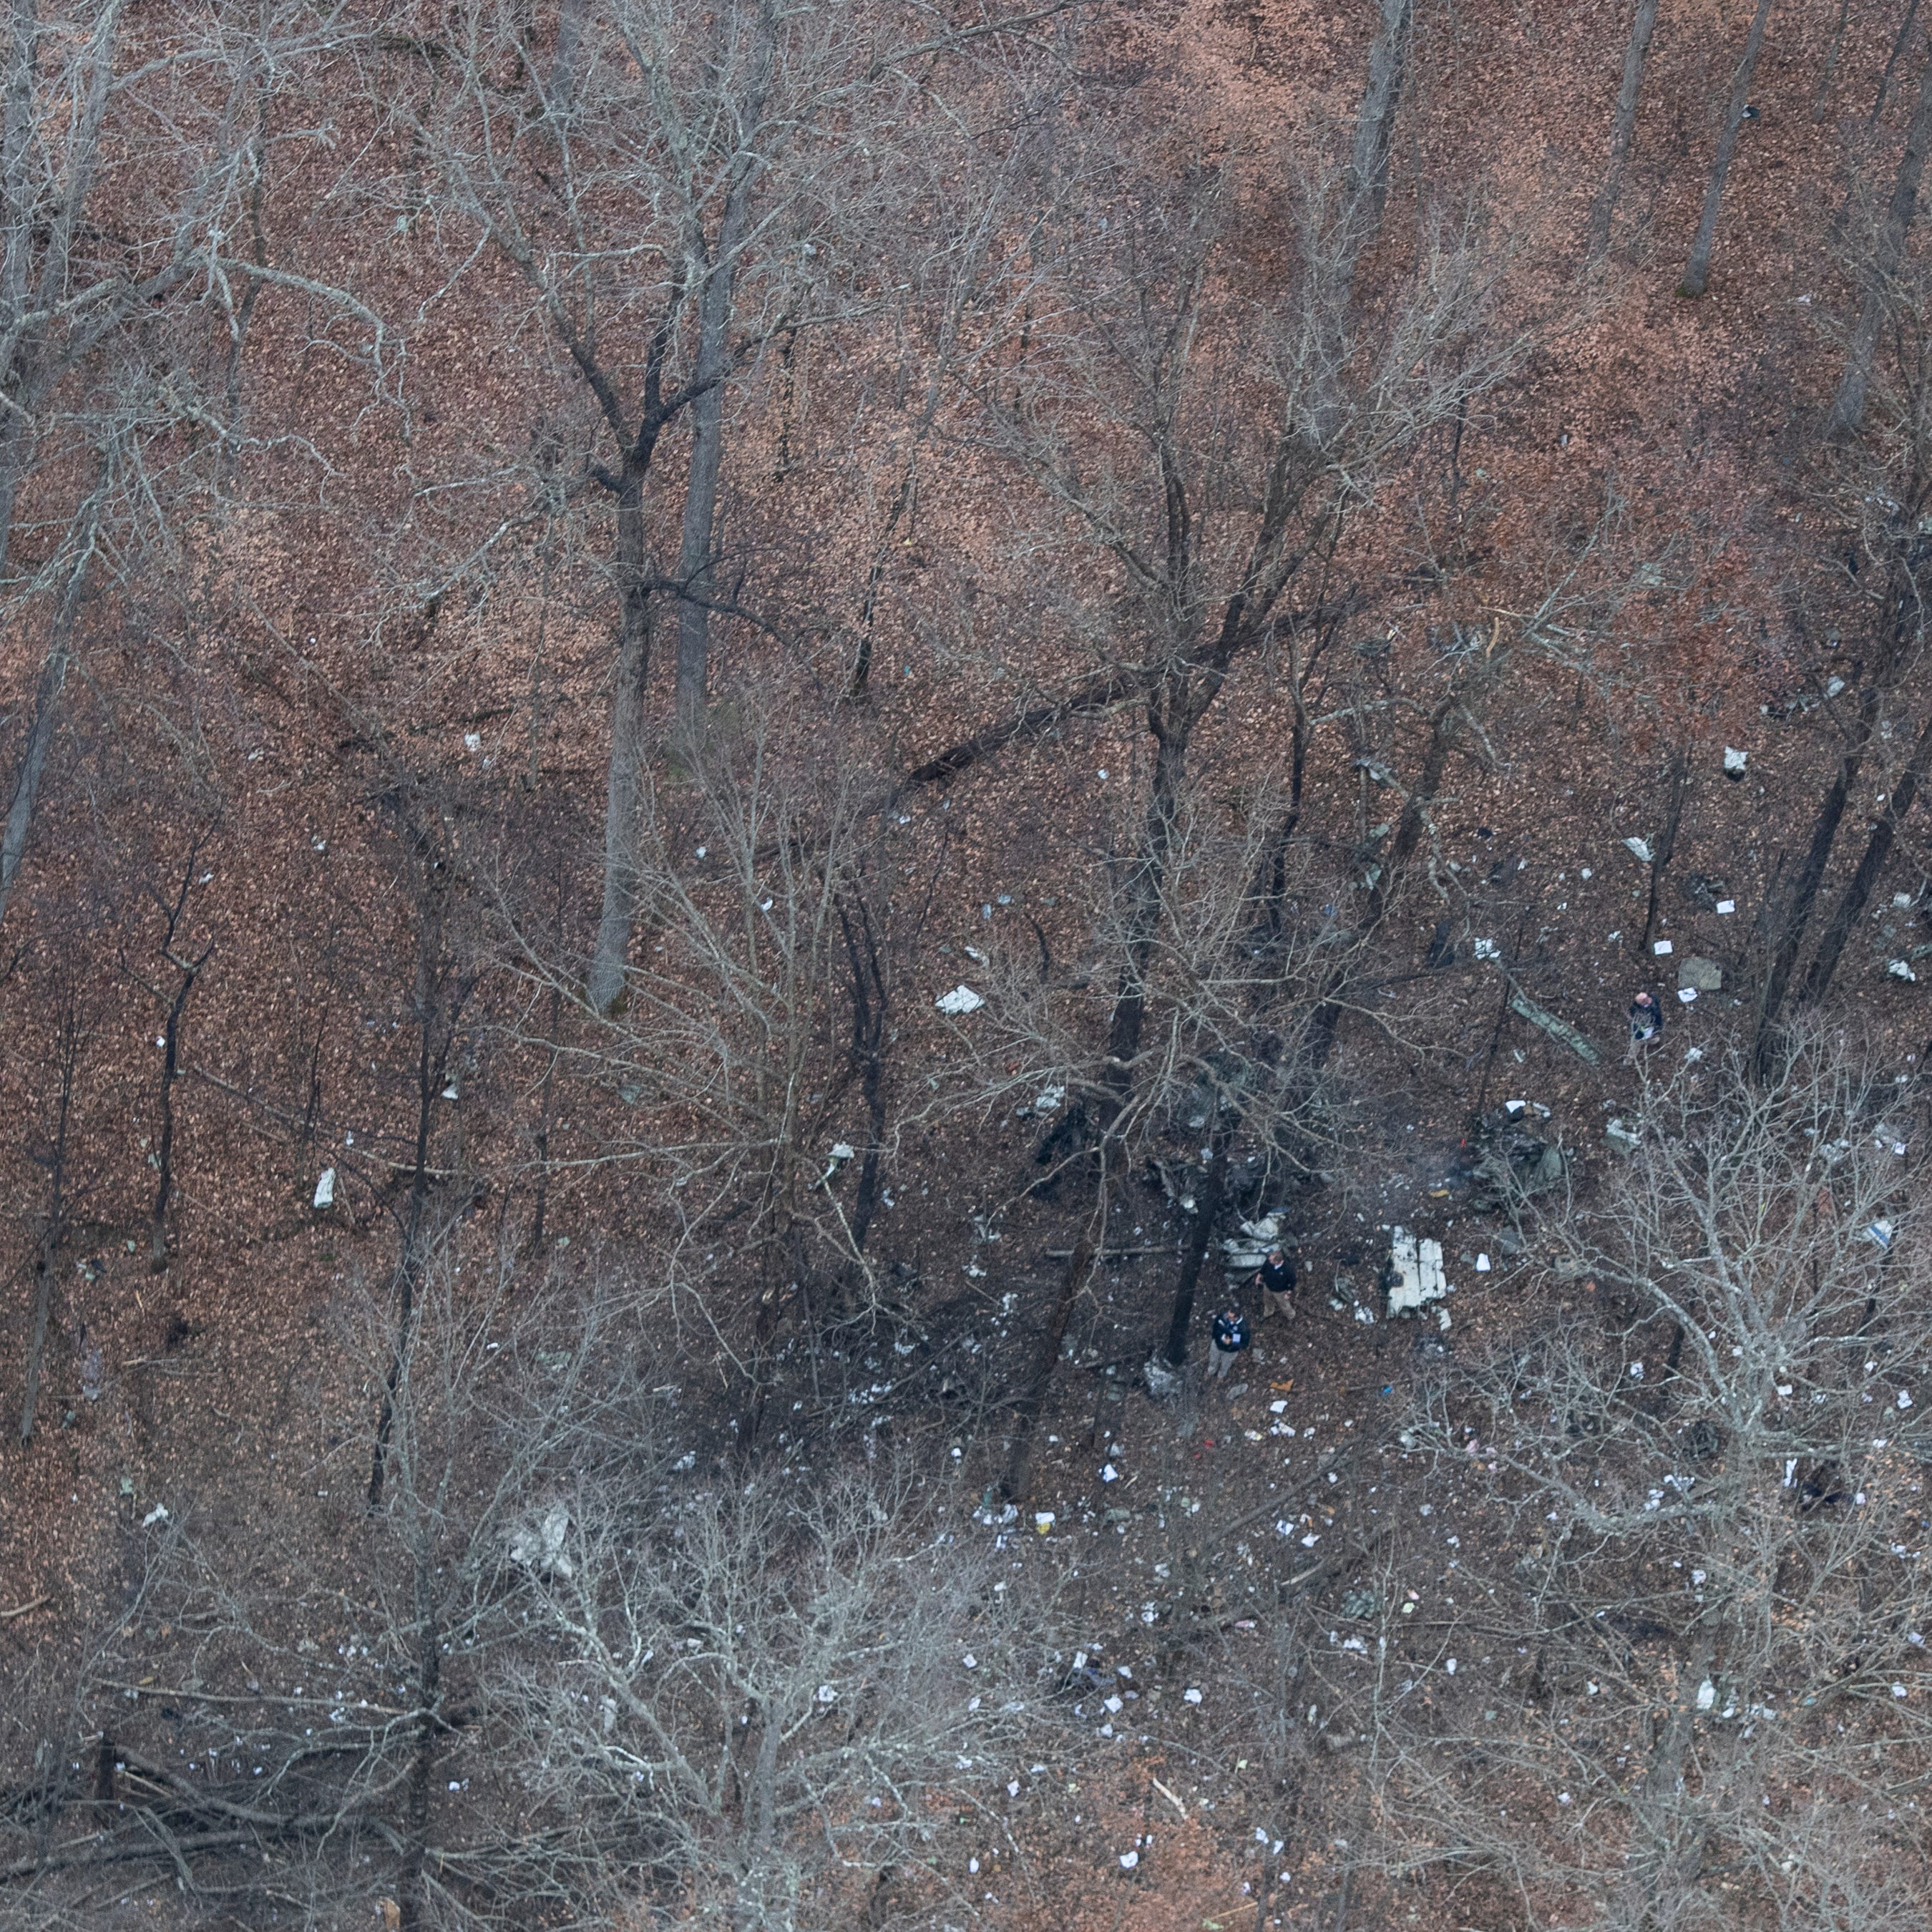 Indiana plane crash kills 3, including LouCity founder Wayne Estopinal